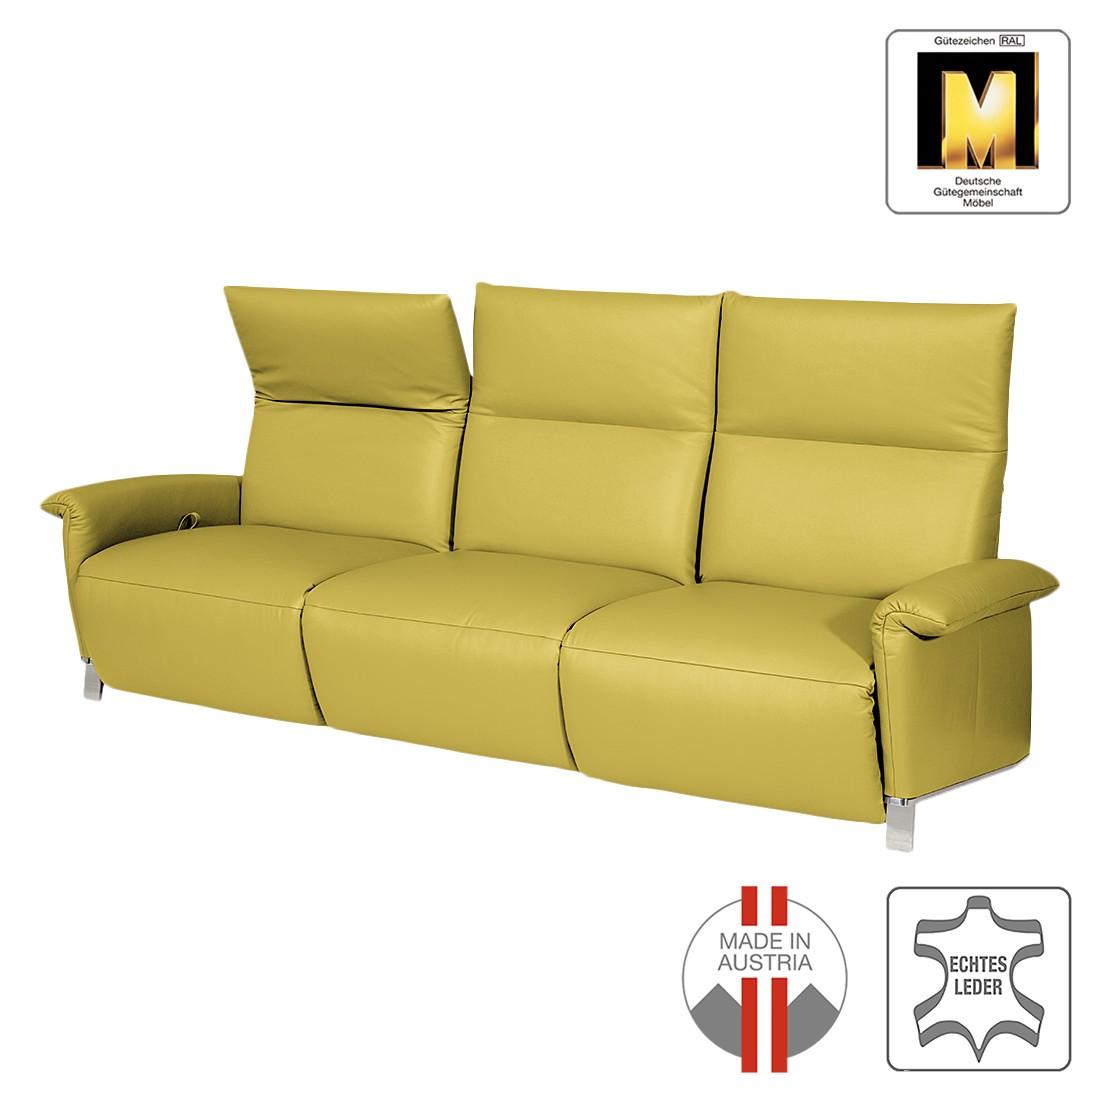 einzelsofas archives. Black Bedroom Furniture Sets. Home Design Ideas